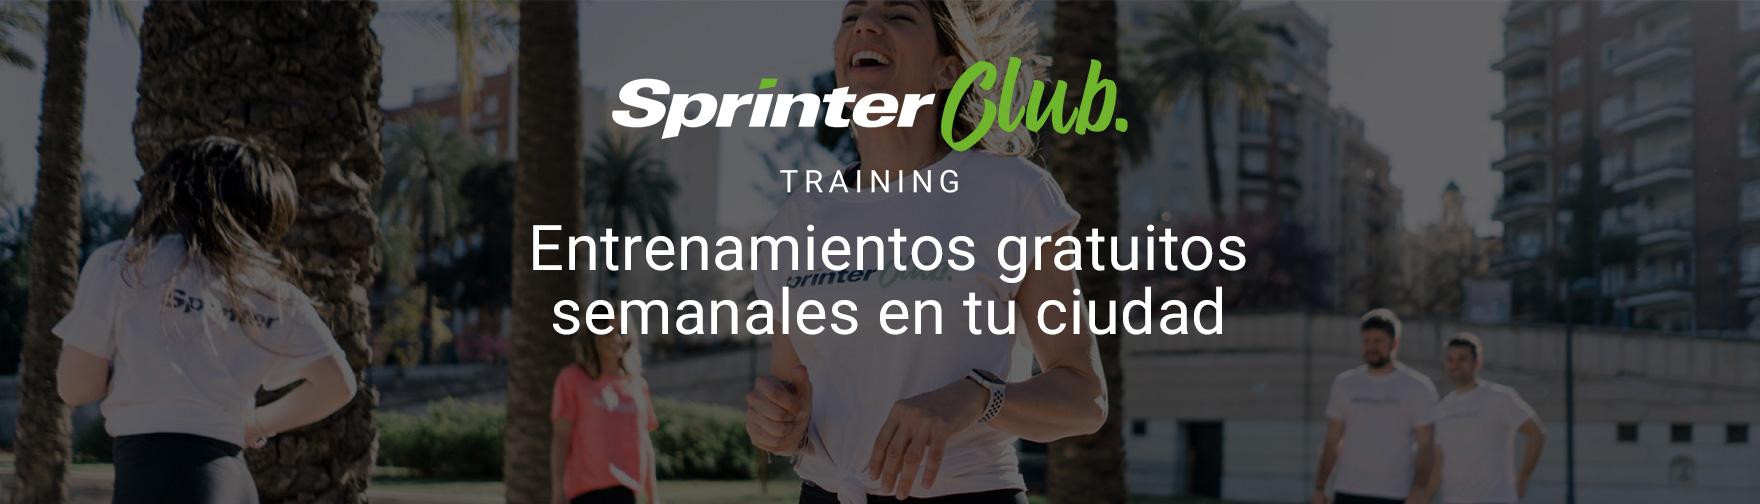 Sprinter Club Training